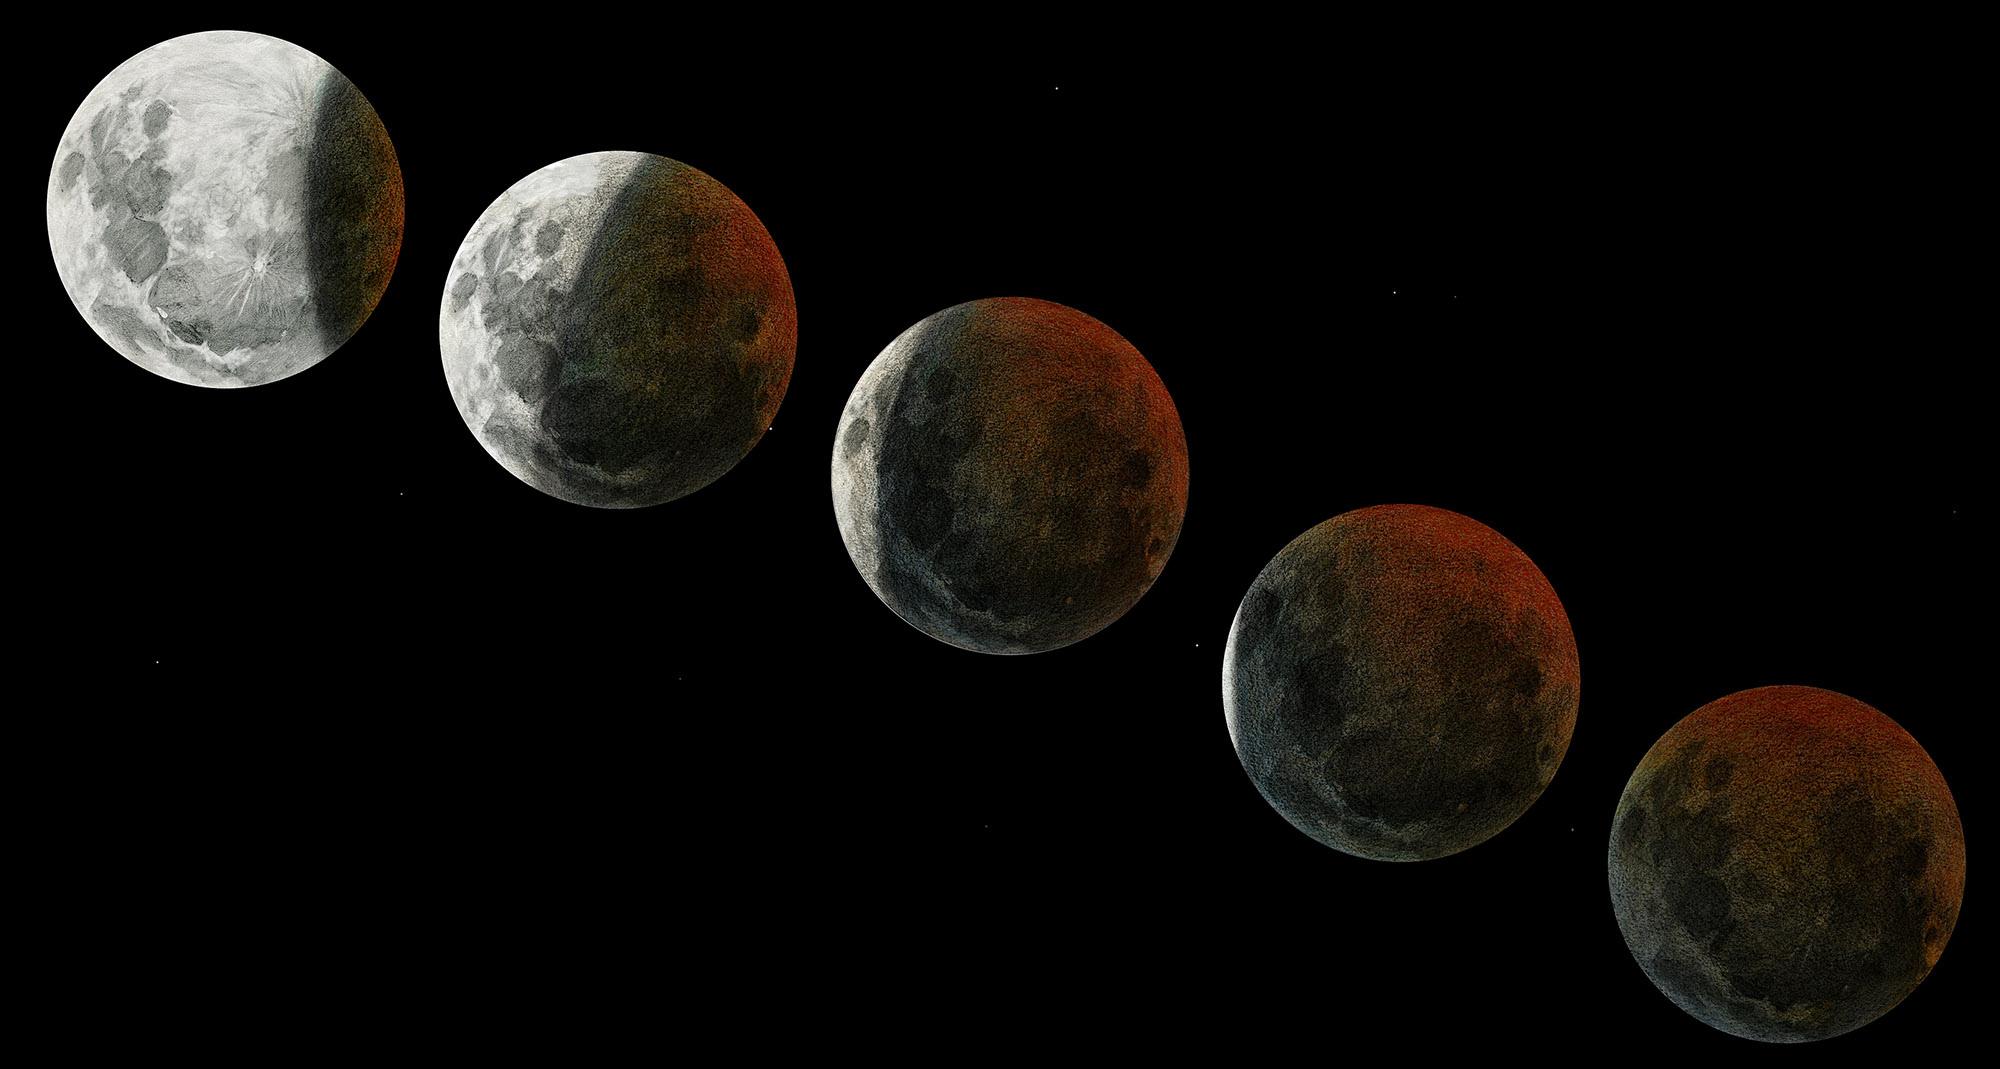 lune_19_01_c.jpg.c23c4d82424685ec91210ed7c2afc7ba.jpg